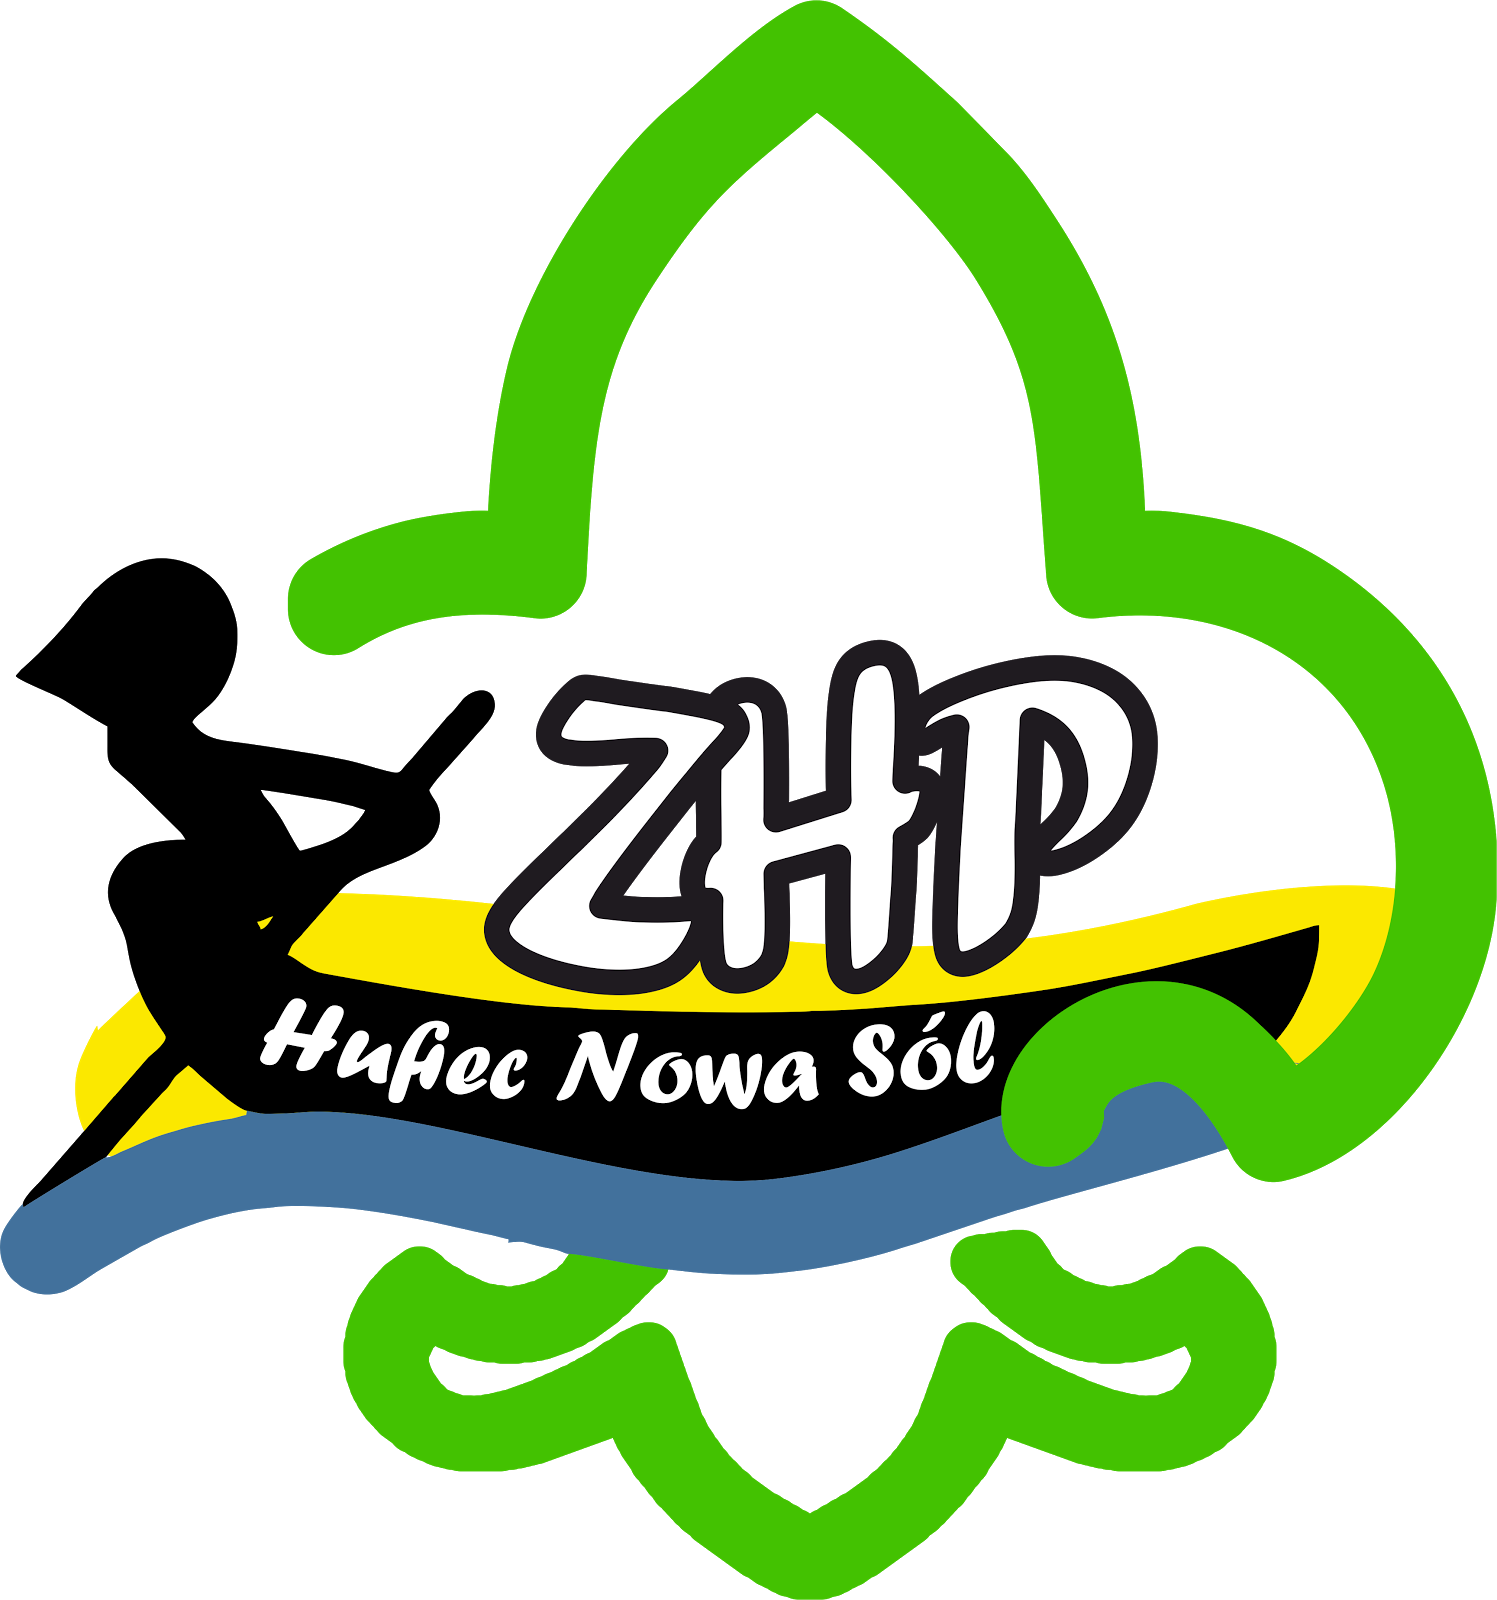 Strona Hufca